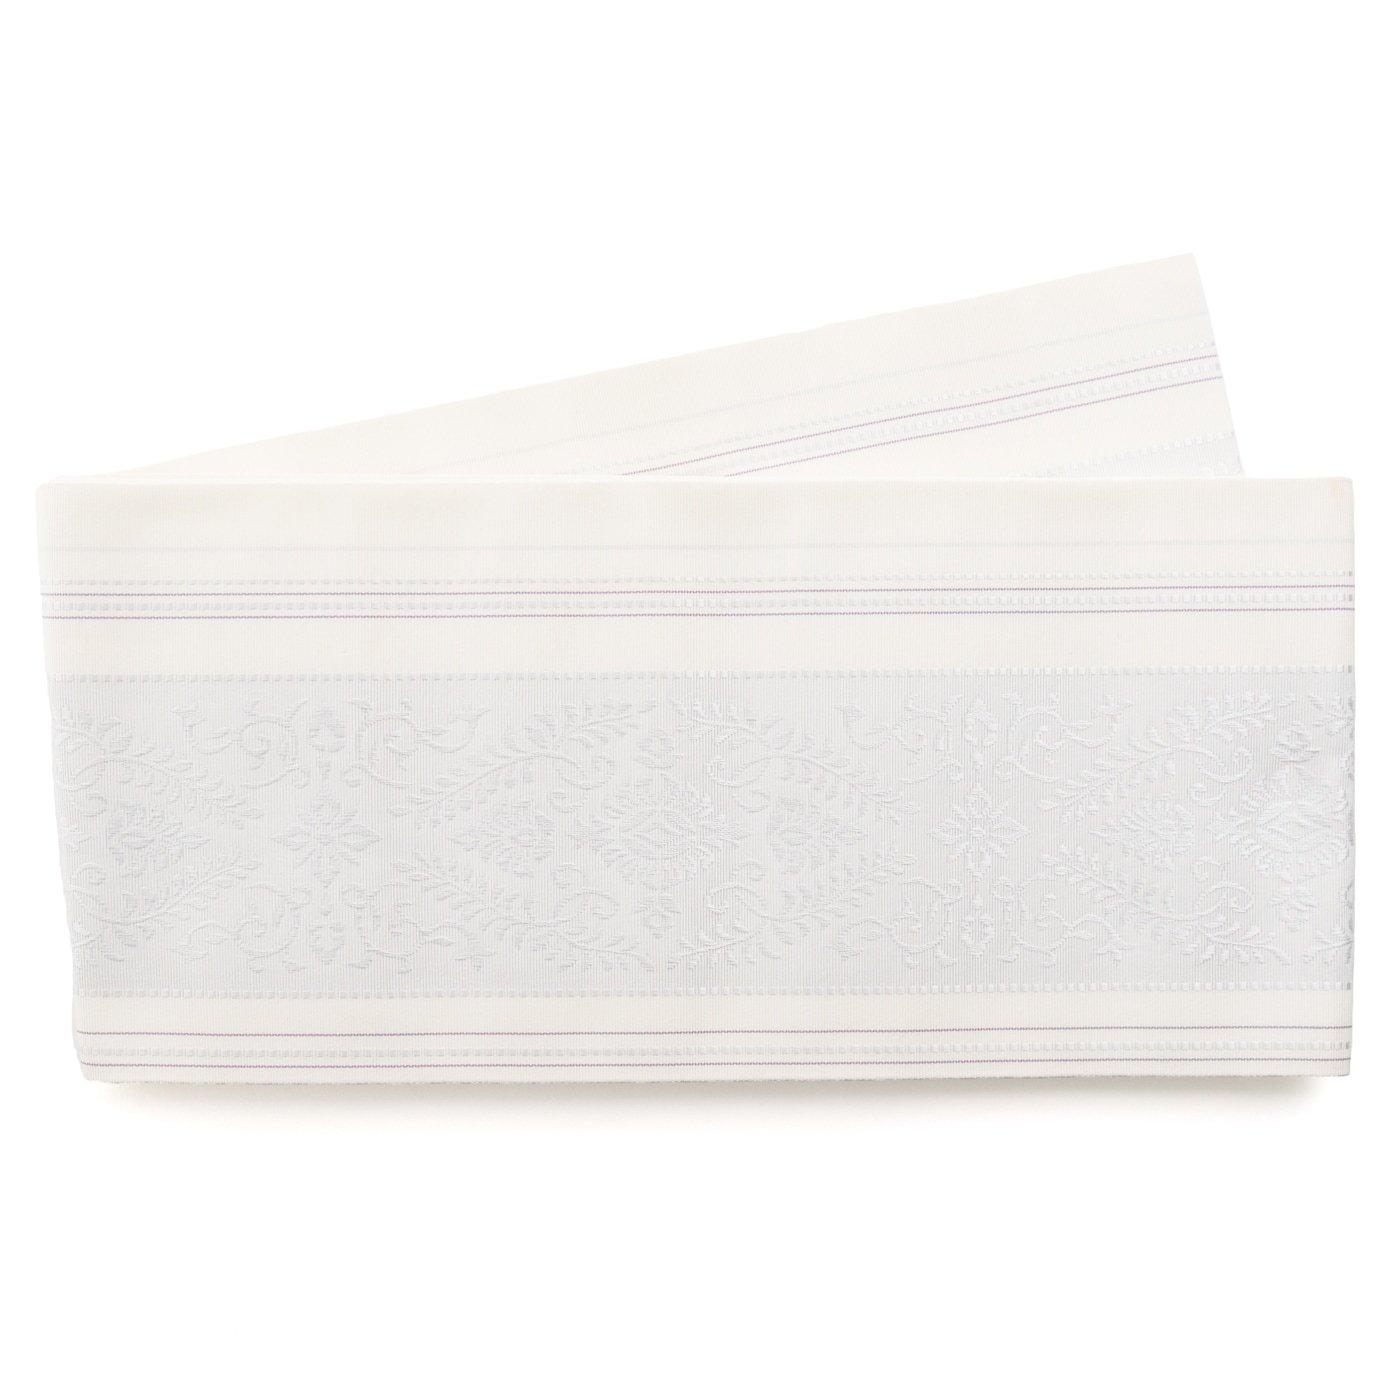 「森博多織 花紋 白」の商品画像